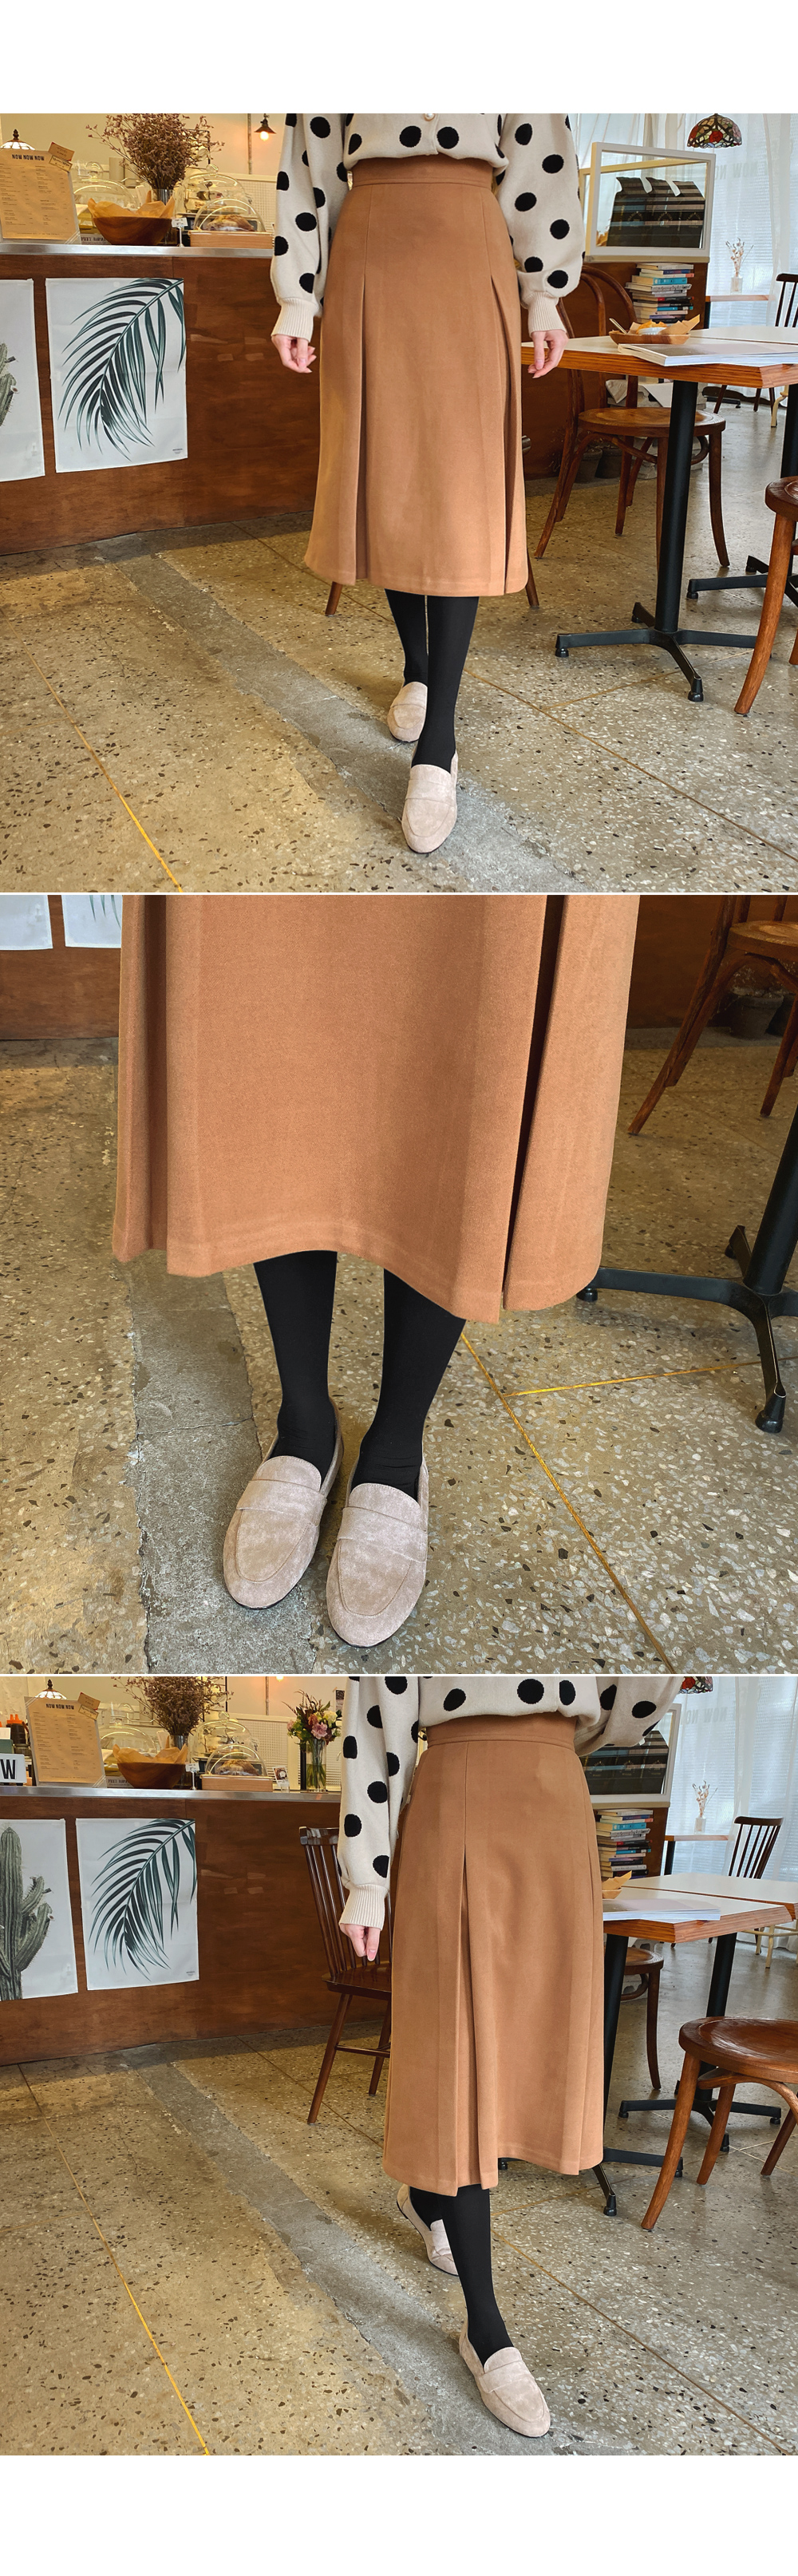 Suede pintac skirt